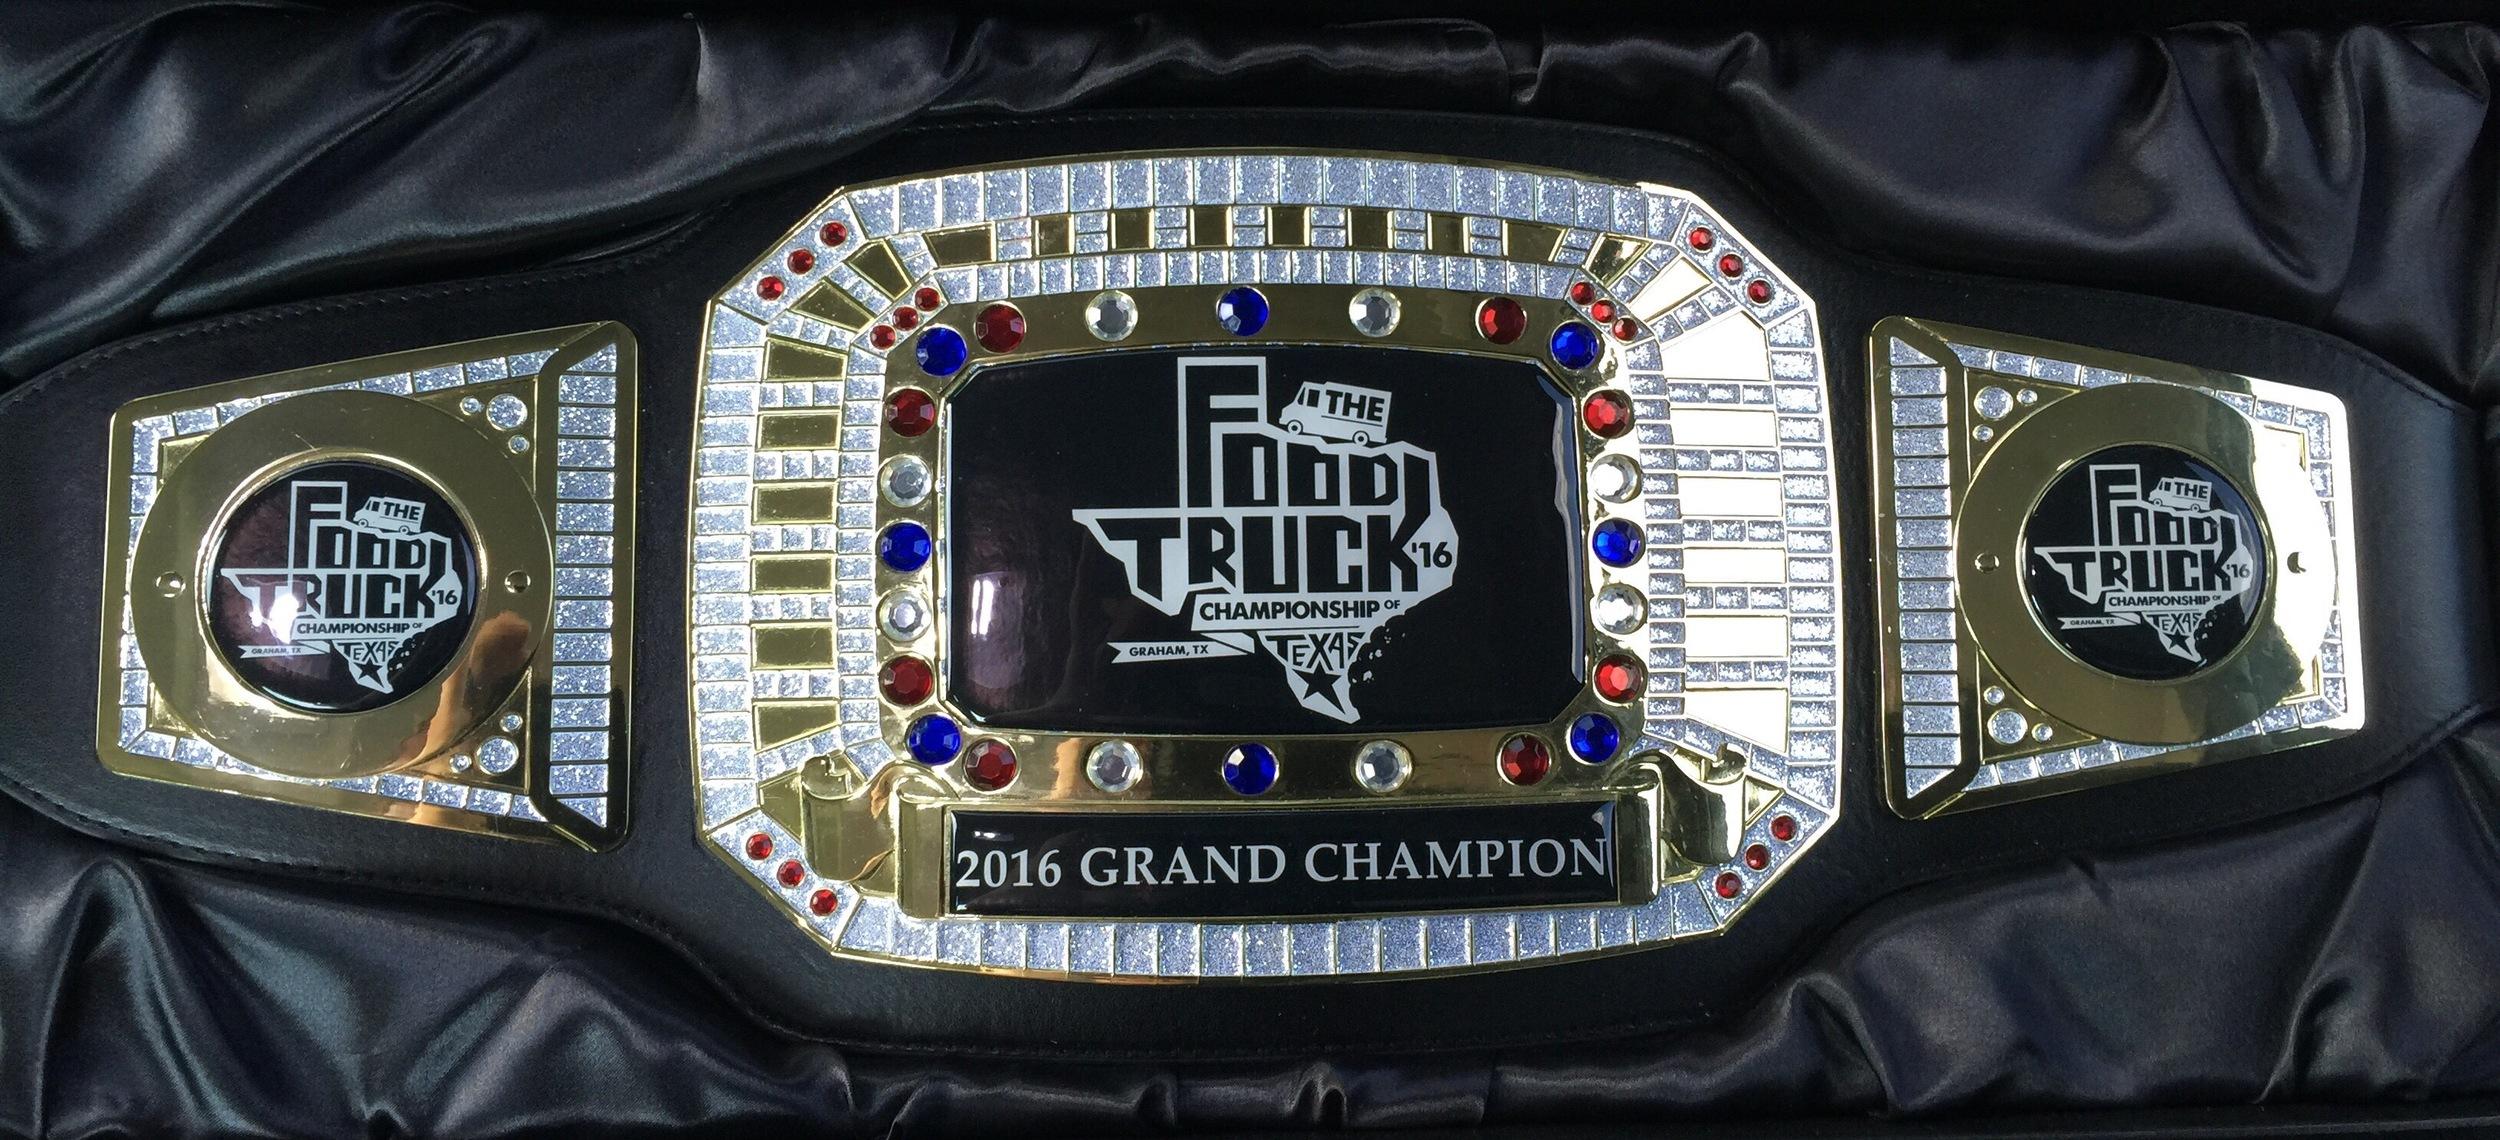 2016 Grand Champion Belt